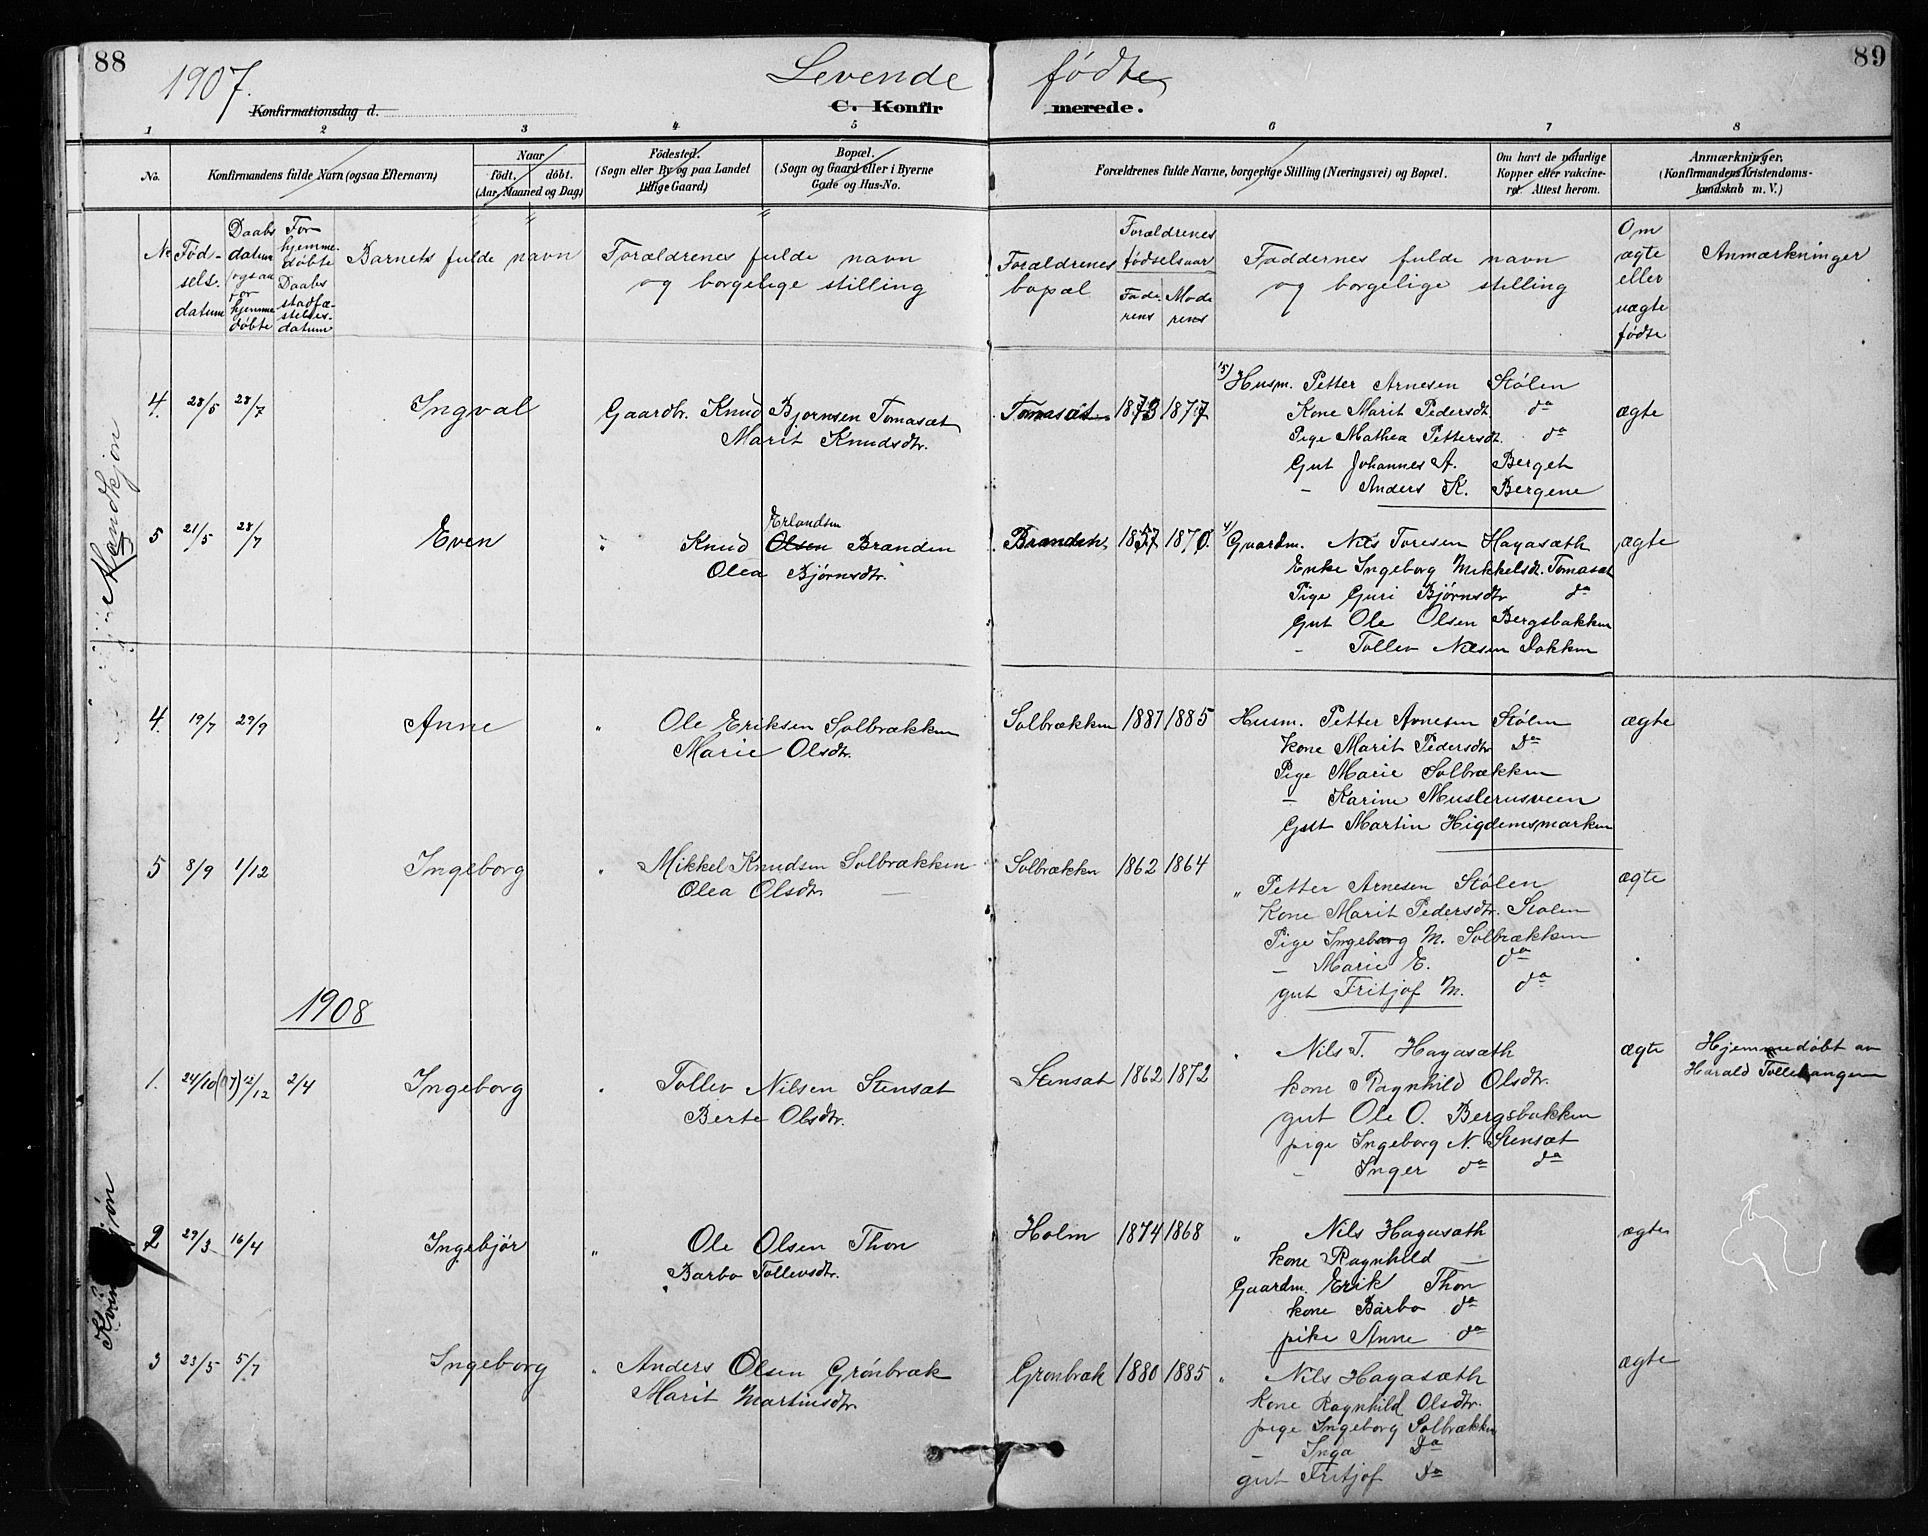 SAH, Etnedal prestekontor, H/Ha/Hab/Habb/L0001: Klokkerbok nr. II 1, 1894-1911, s. 88-89